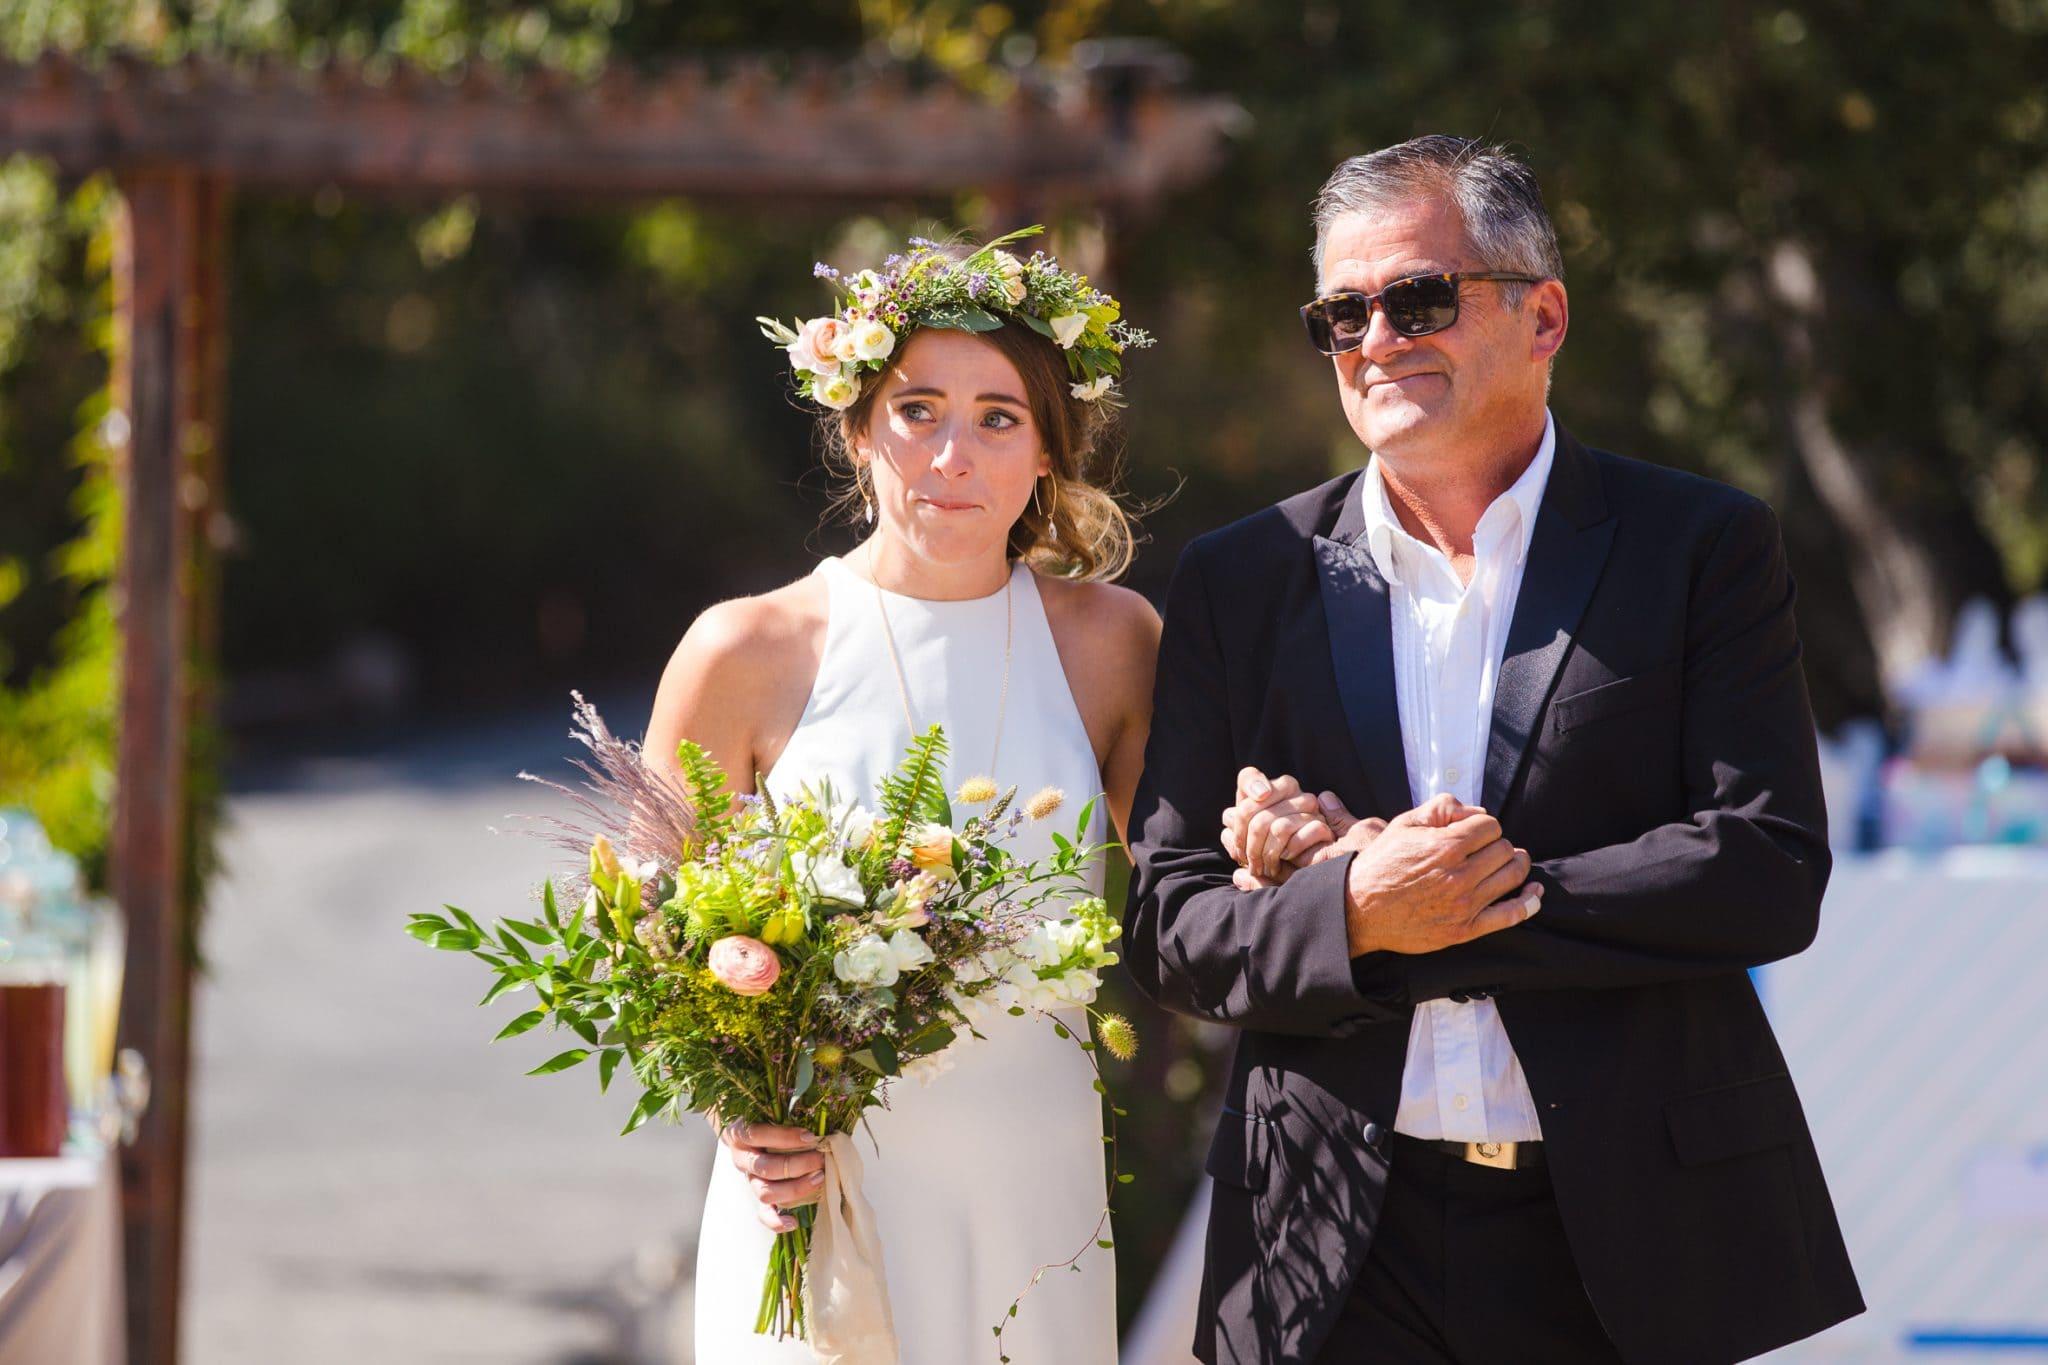 duskin-allison-wedding-365